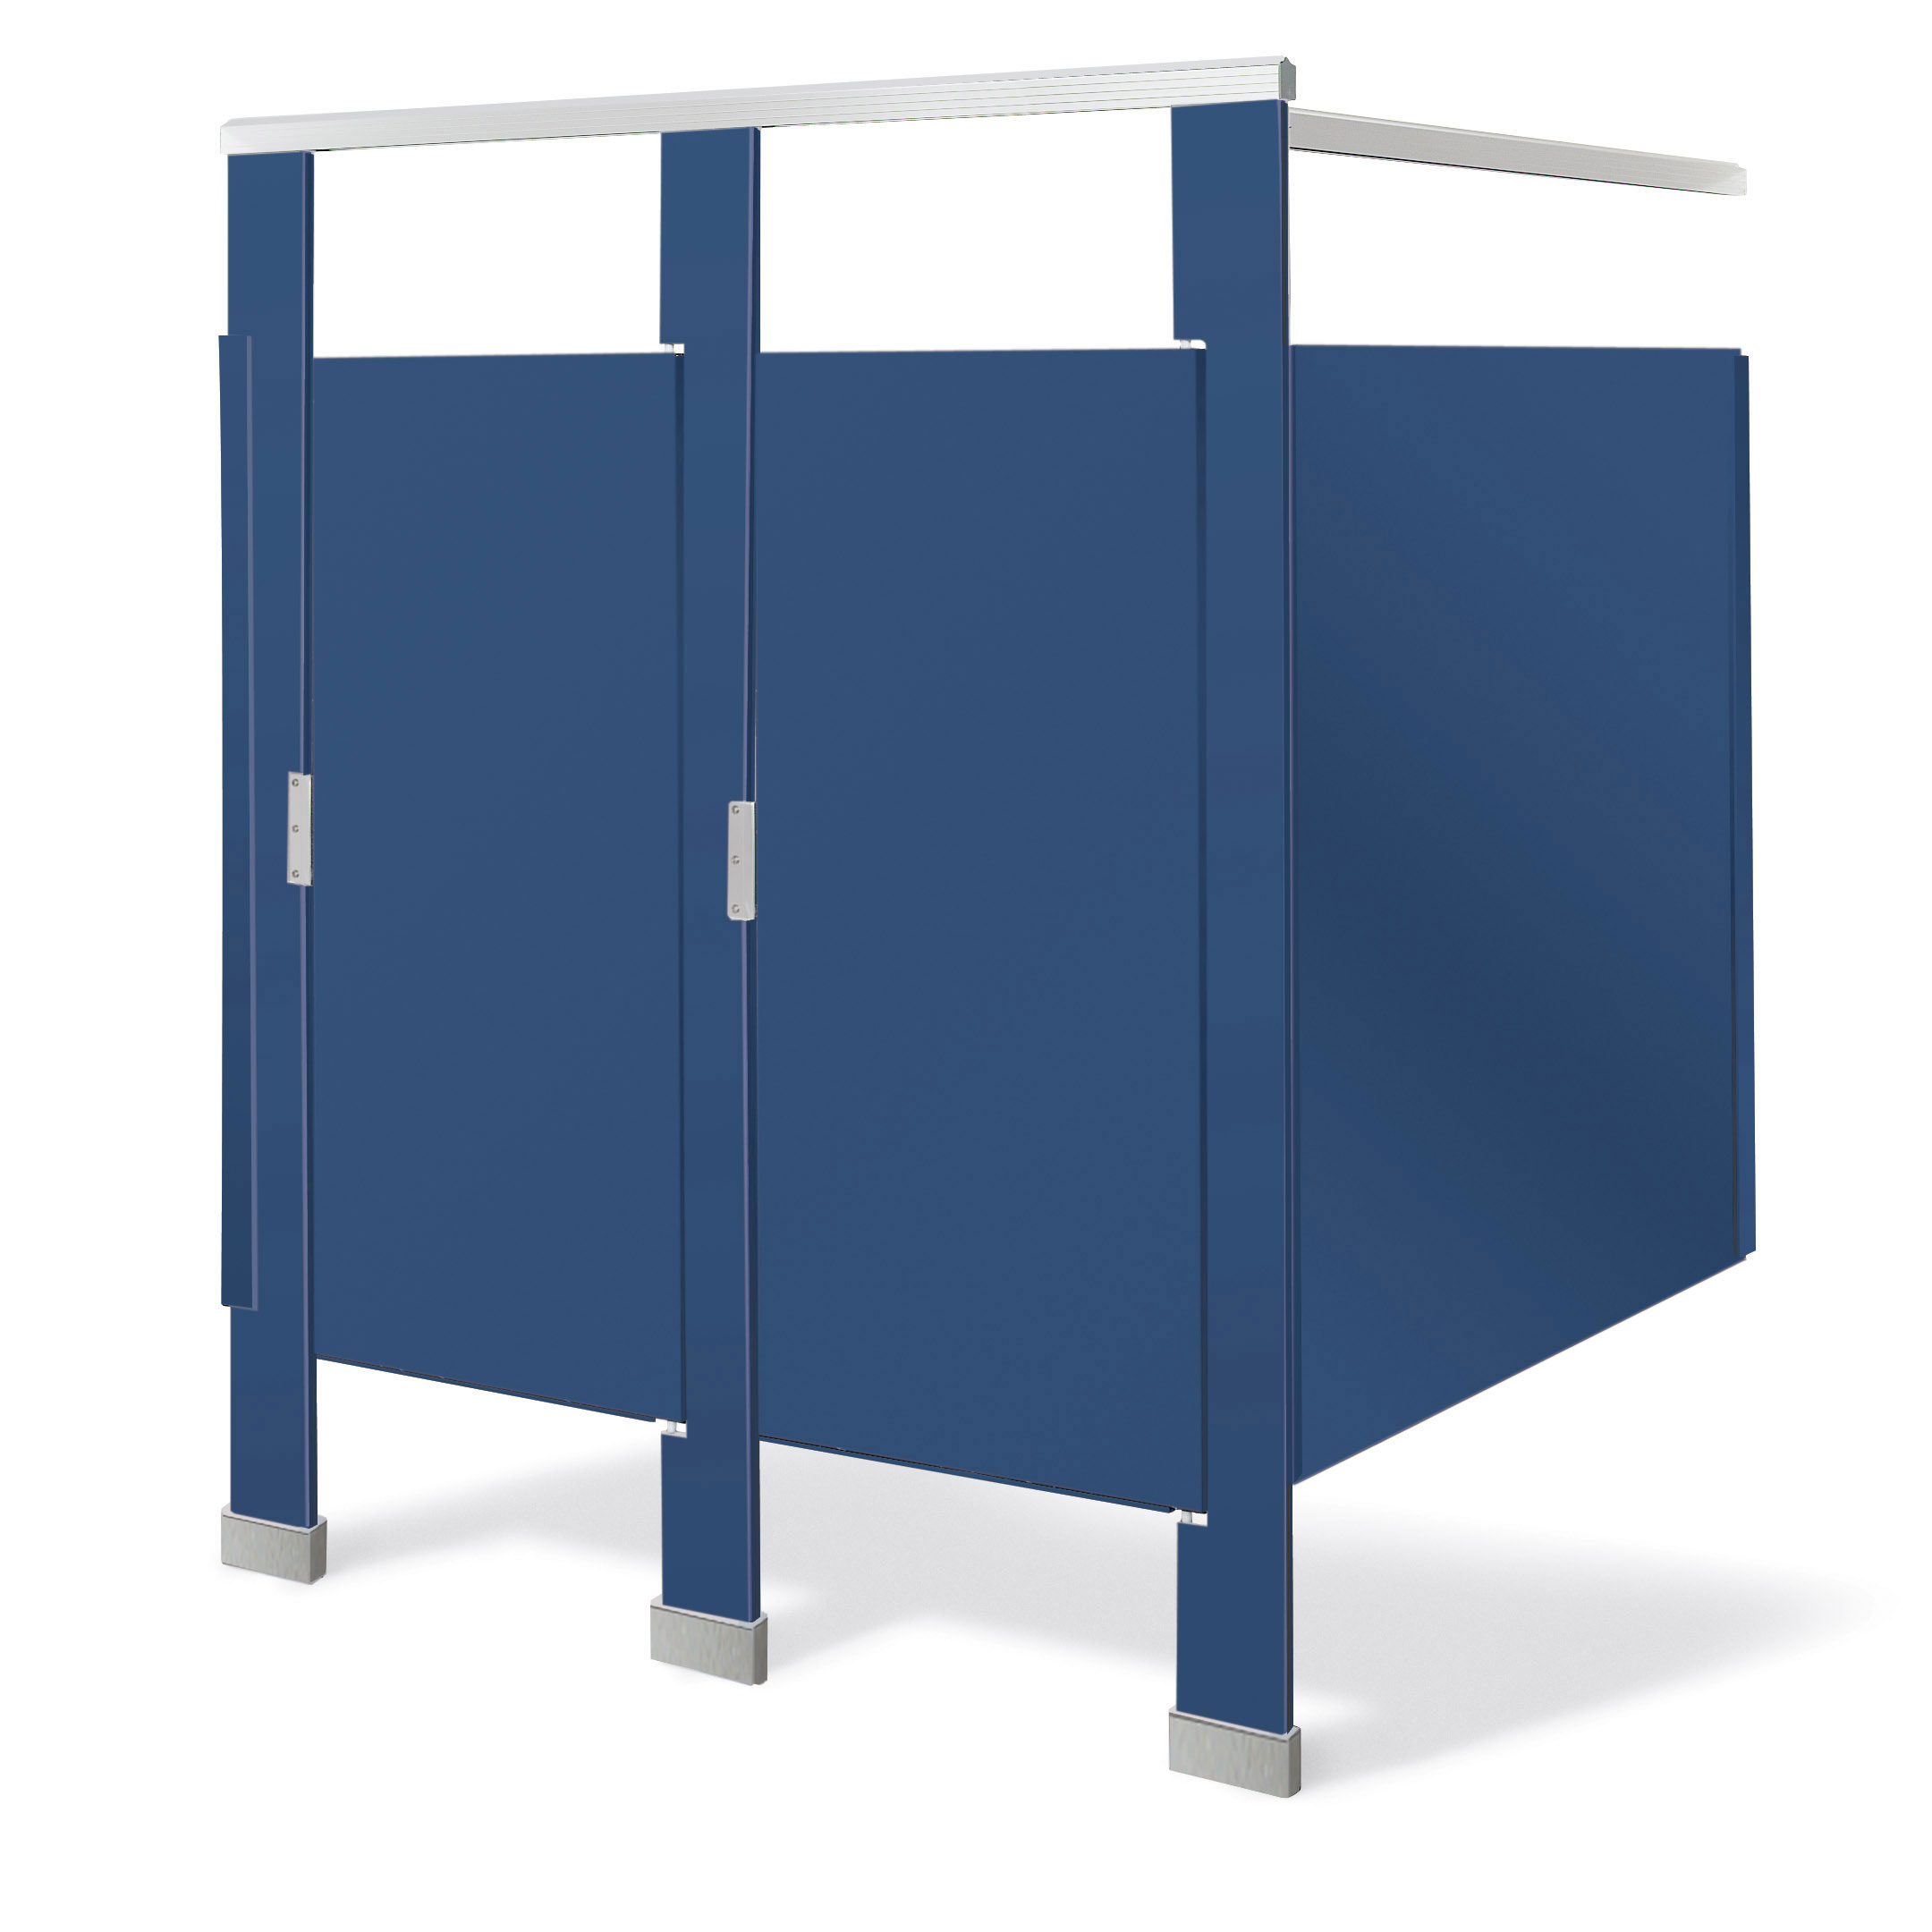 Bathroom-Stalls-Commercial